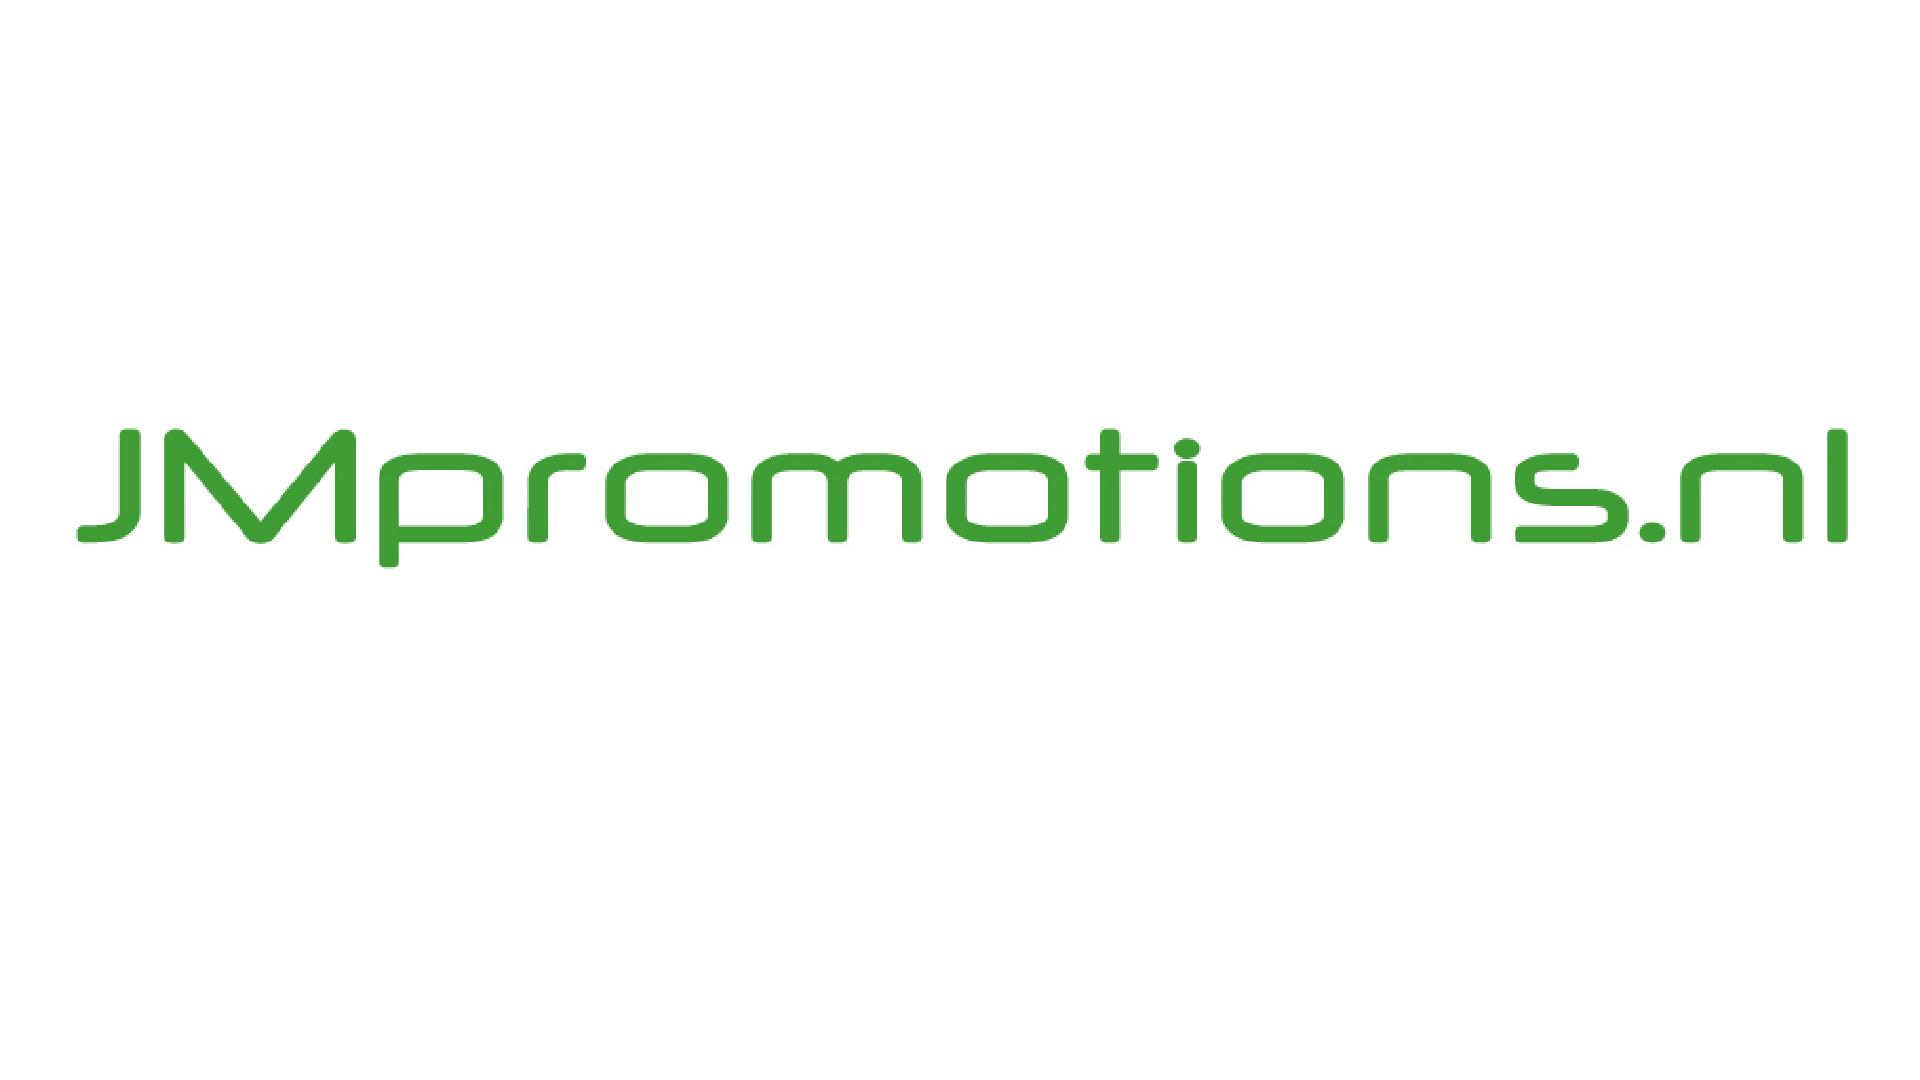 JMpromotions